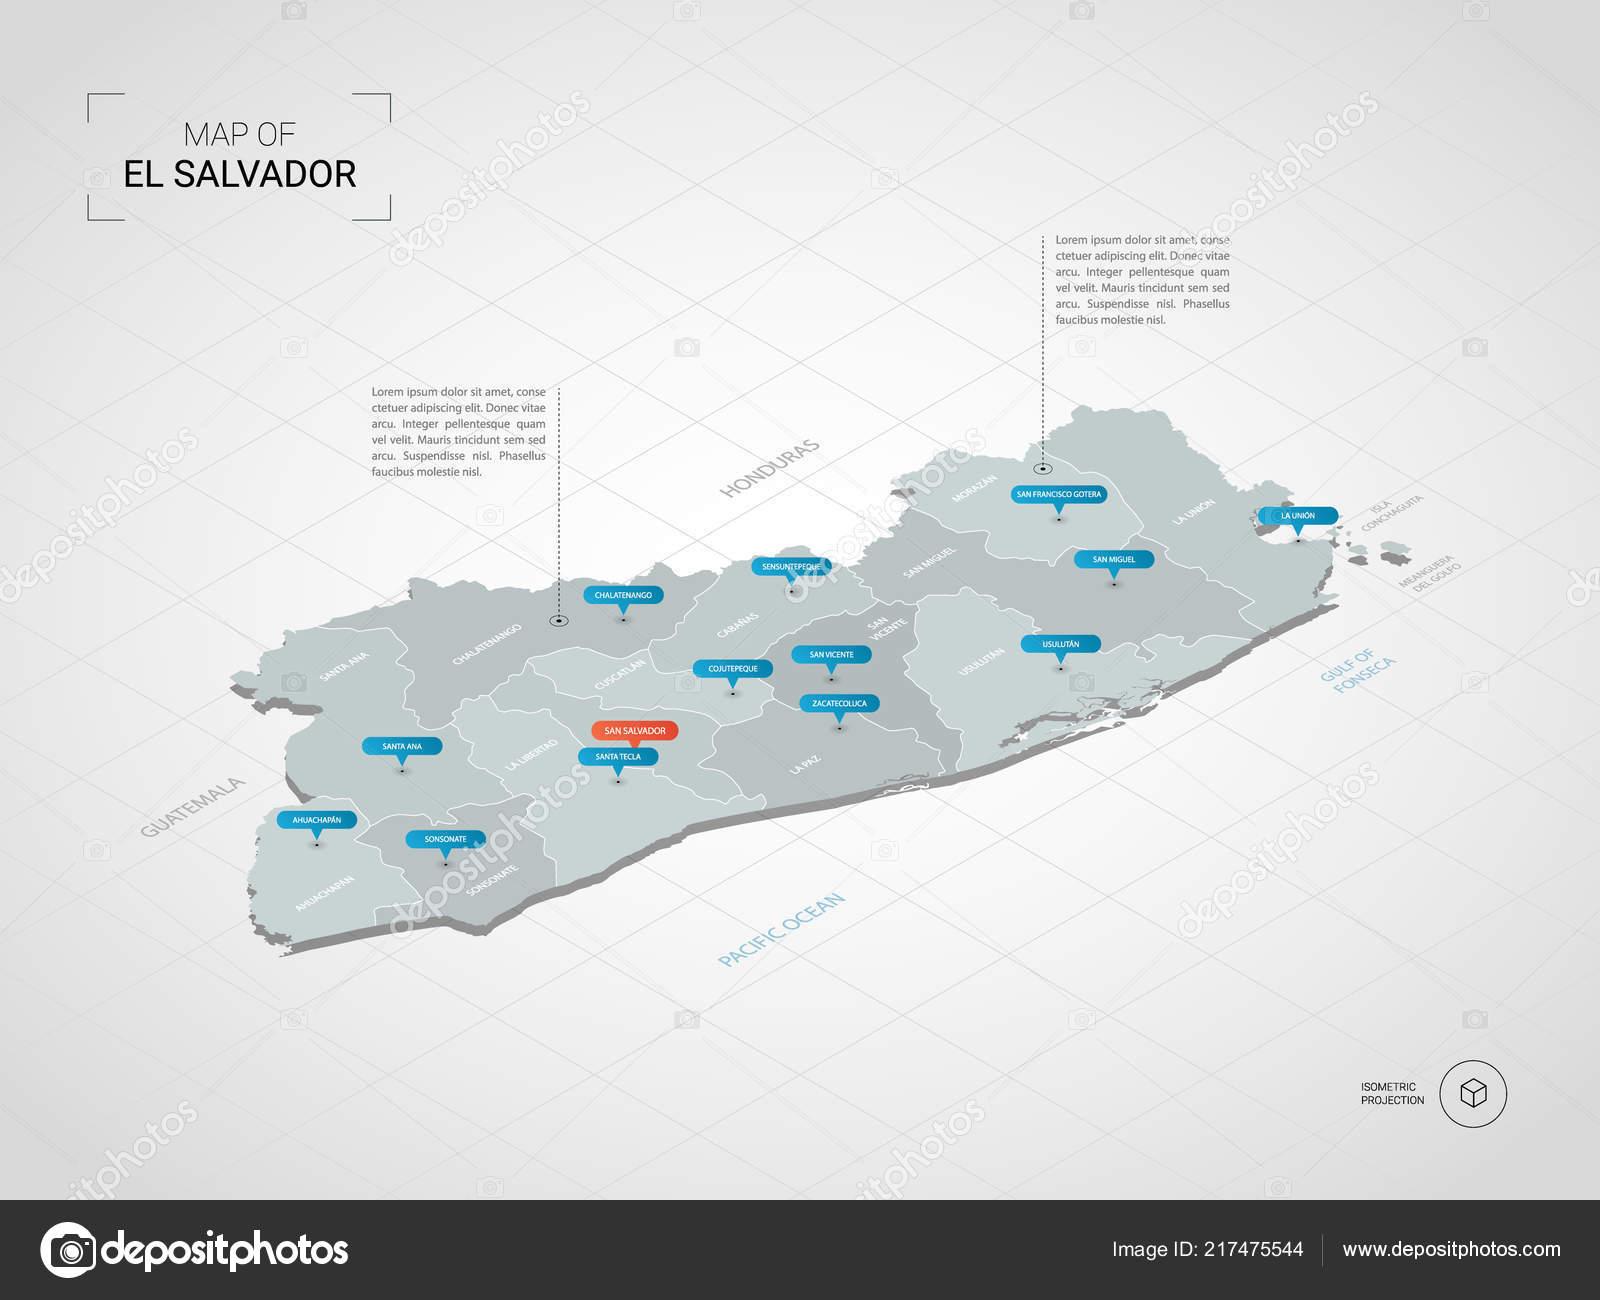 Isometric Salvador Map Stylized Vector Map Illustration ... on map of isla margarita, map of campinas, map of san pedro de atacama, map of bissau, map of guatemala, map of regions of brazil, map of culiacan, map of south of the border, map of san pedro de macoris, map of asunción, map of ciudad del este, map of pereira, map of san pedro la laguna, map of central america, map of ilhabela, map of antarctic sound, map of sunset boulevard, map of la serena, map of honduras, map of san cristobal de las casas,